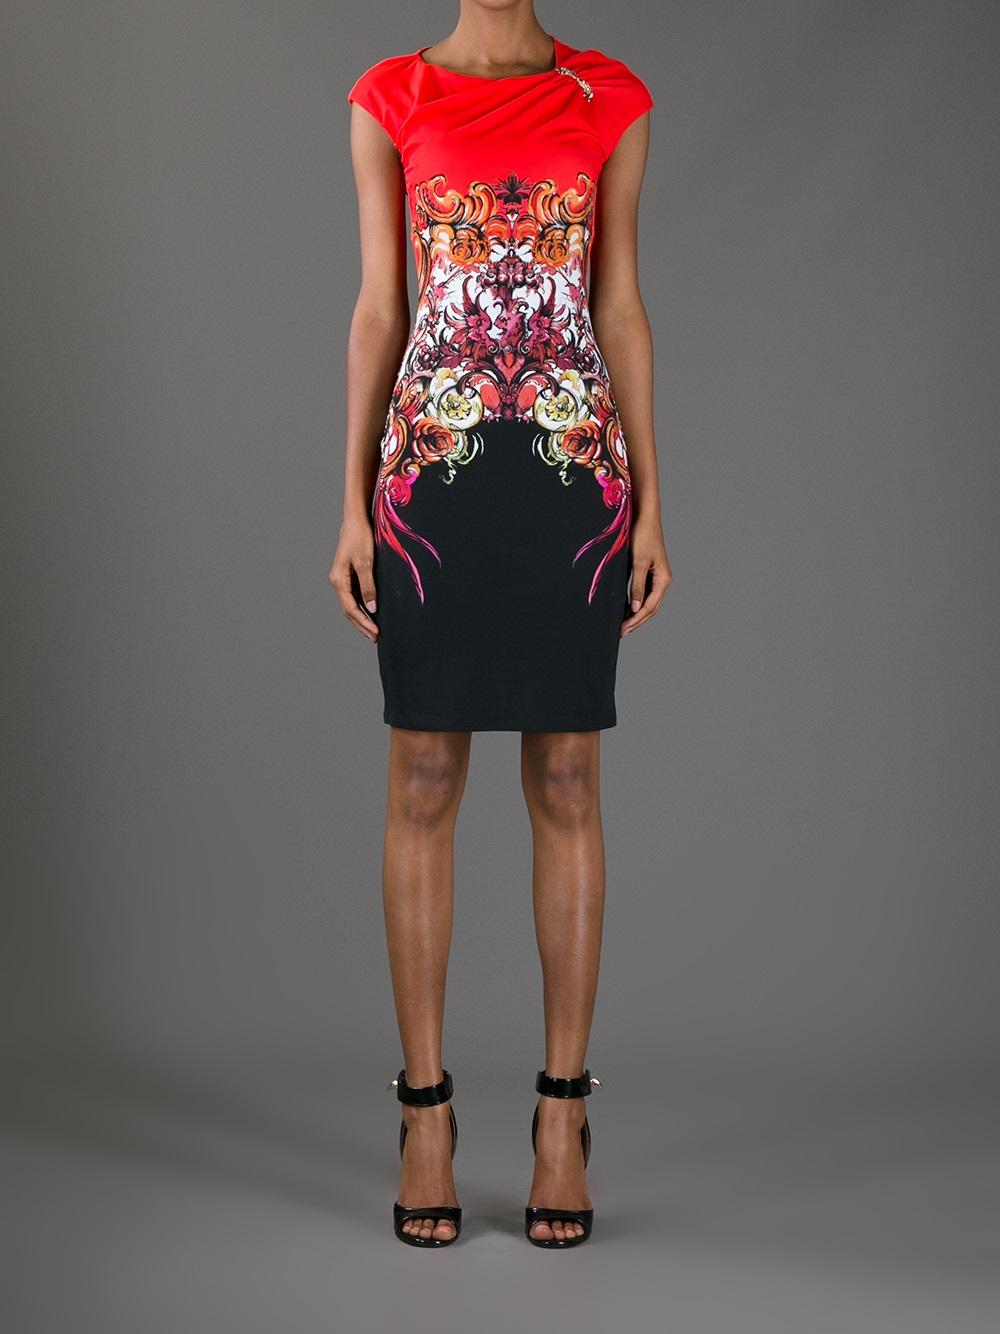 Roberto Cavalli Printed Dress In Red Lyst